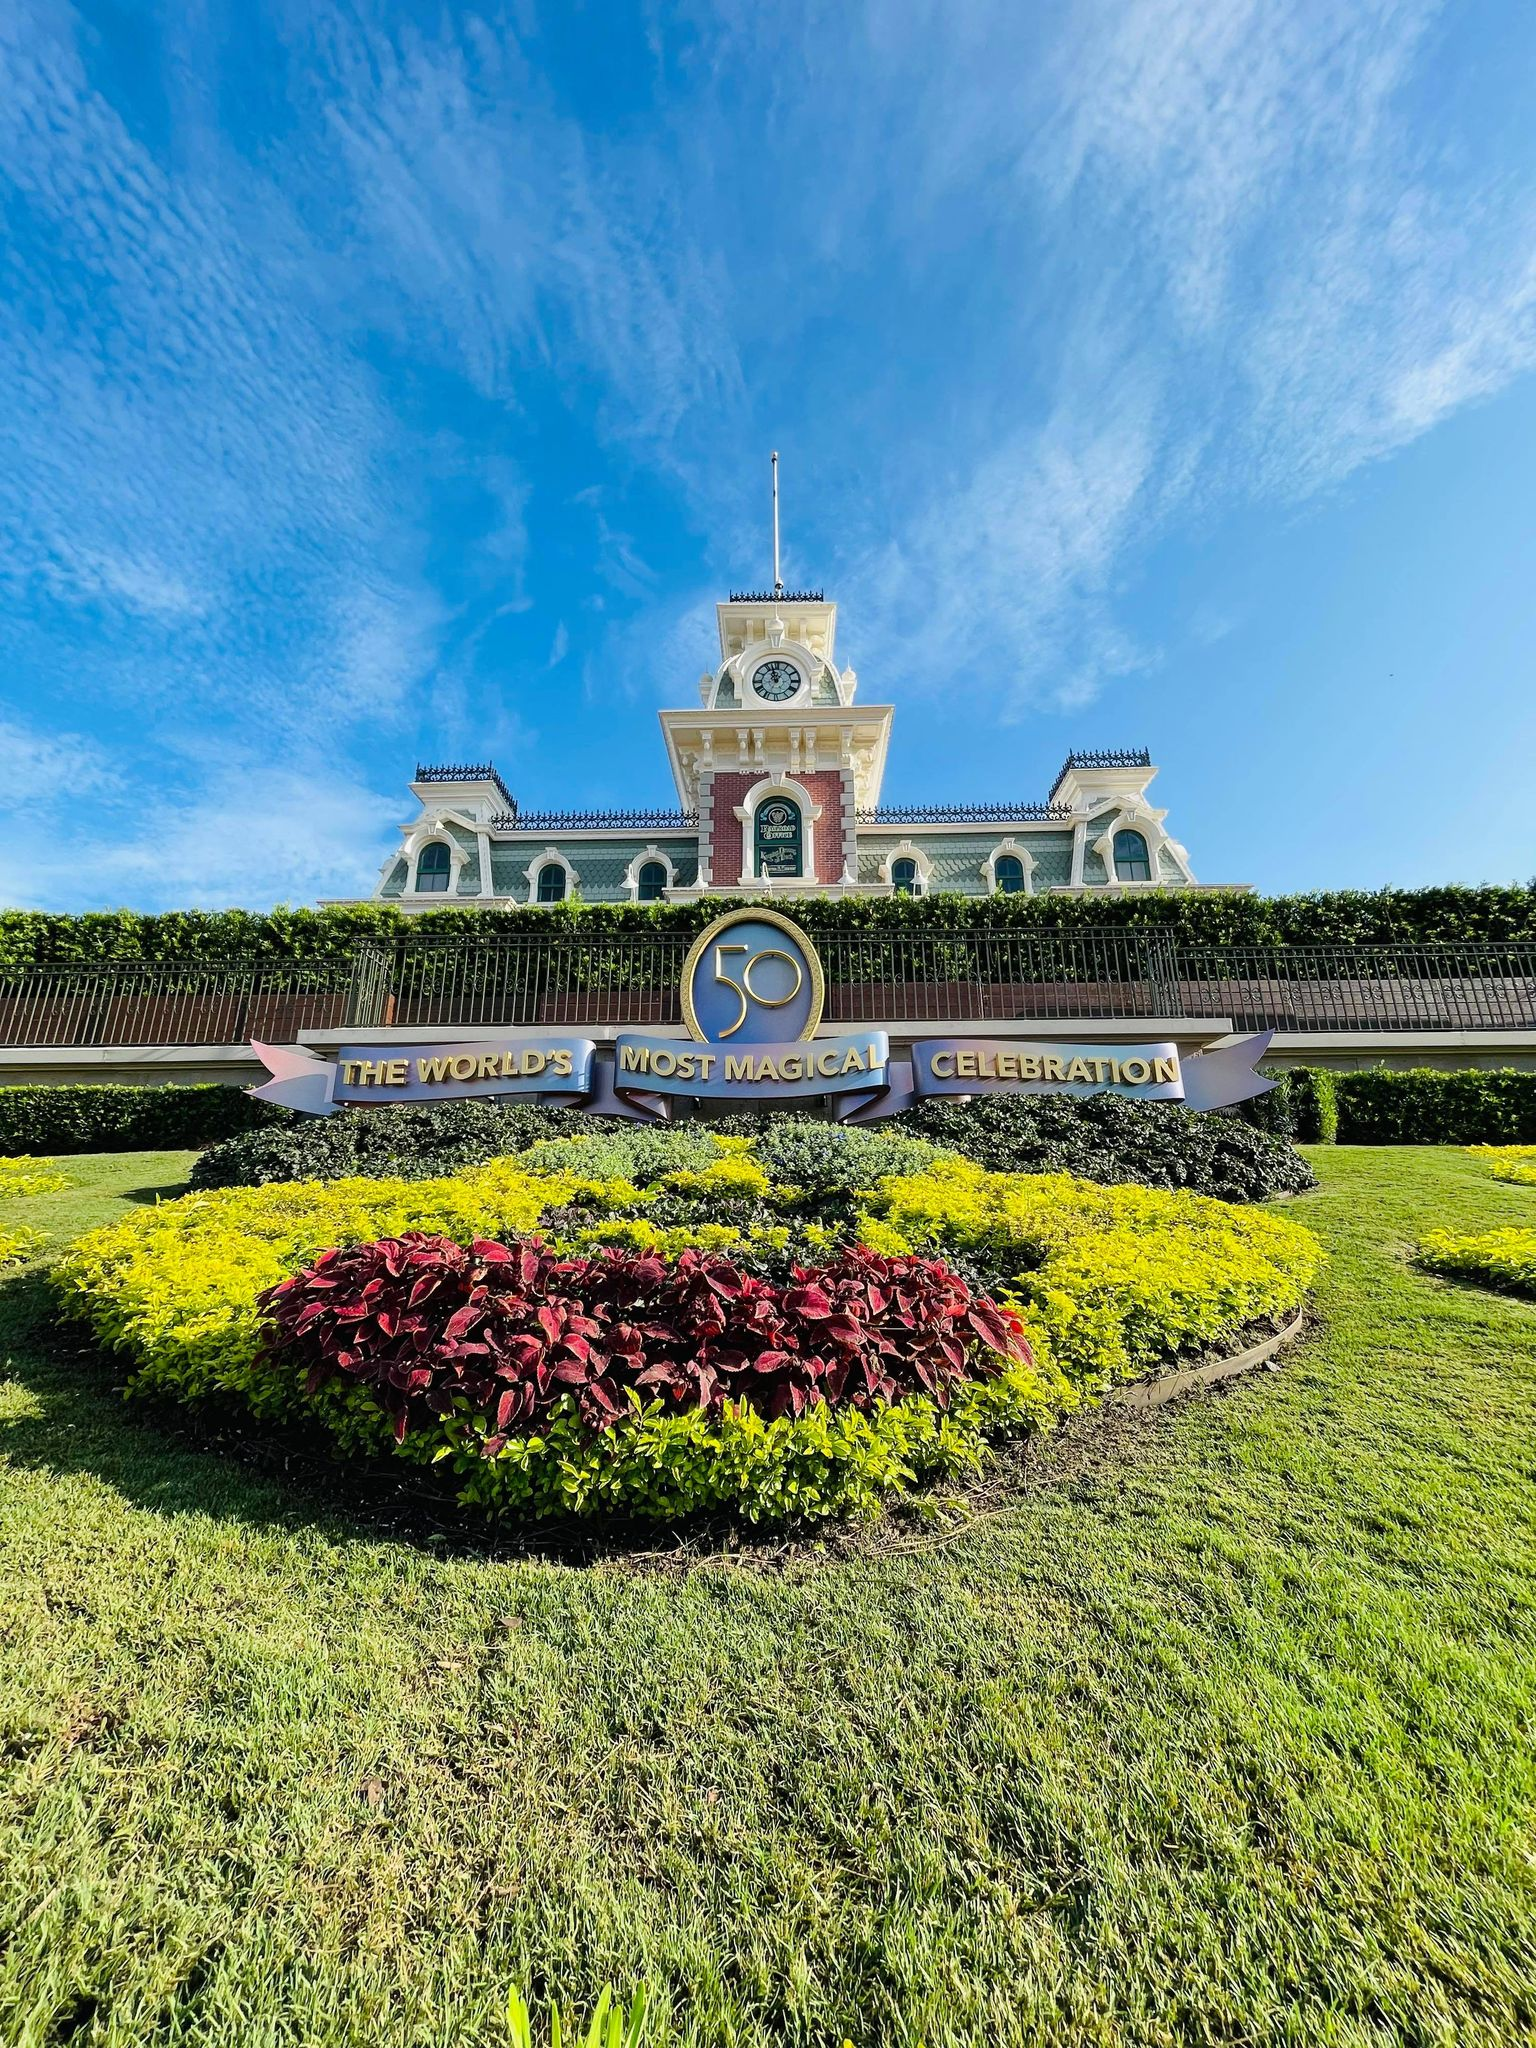 Luxury resort Disney World